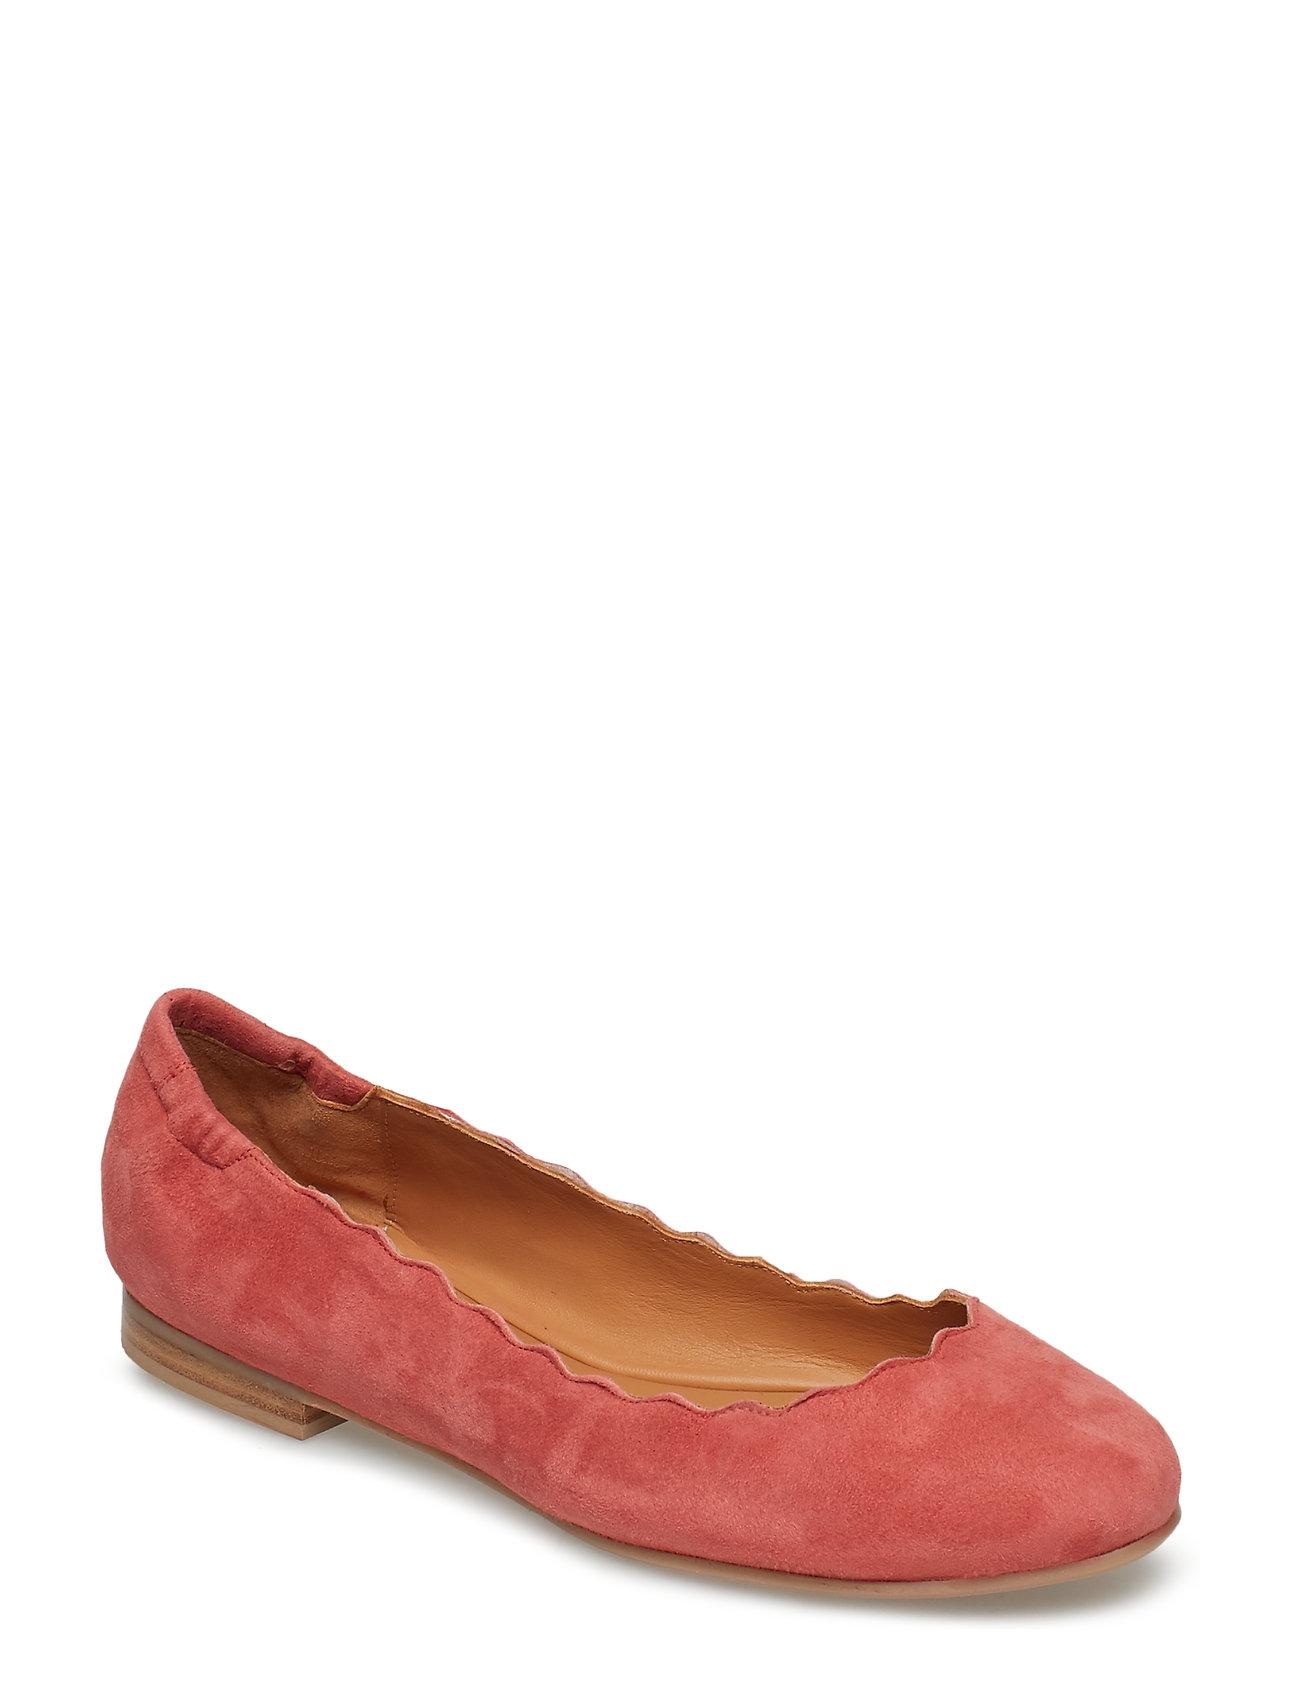 66aa57bc0f7 Shoes Ballerinasko Ballerinaer Lyserød BILLI BI